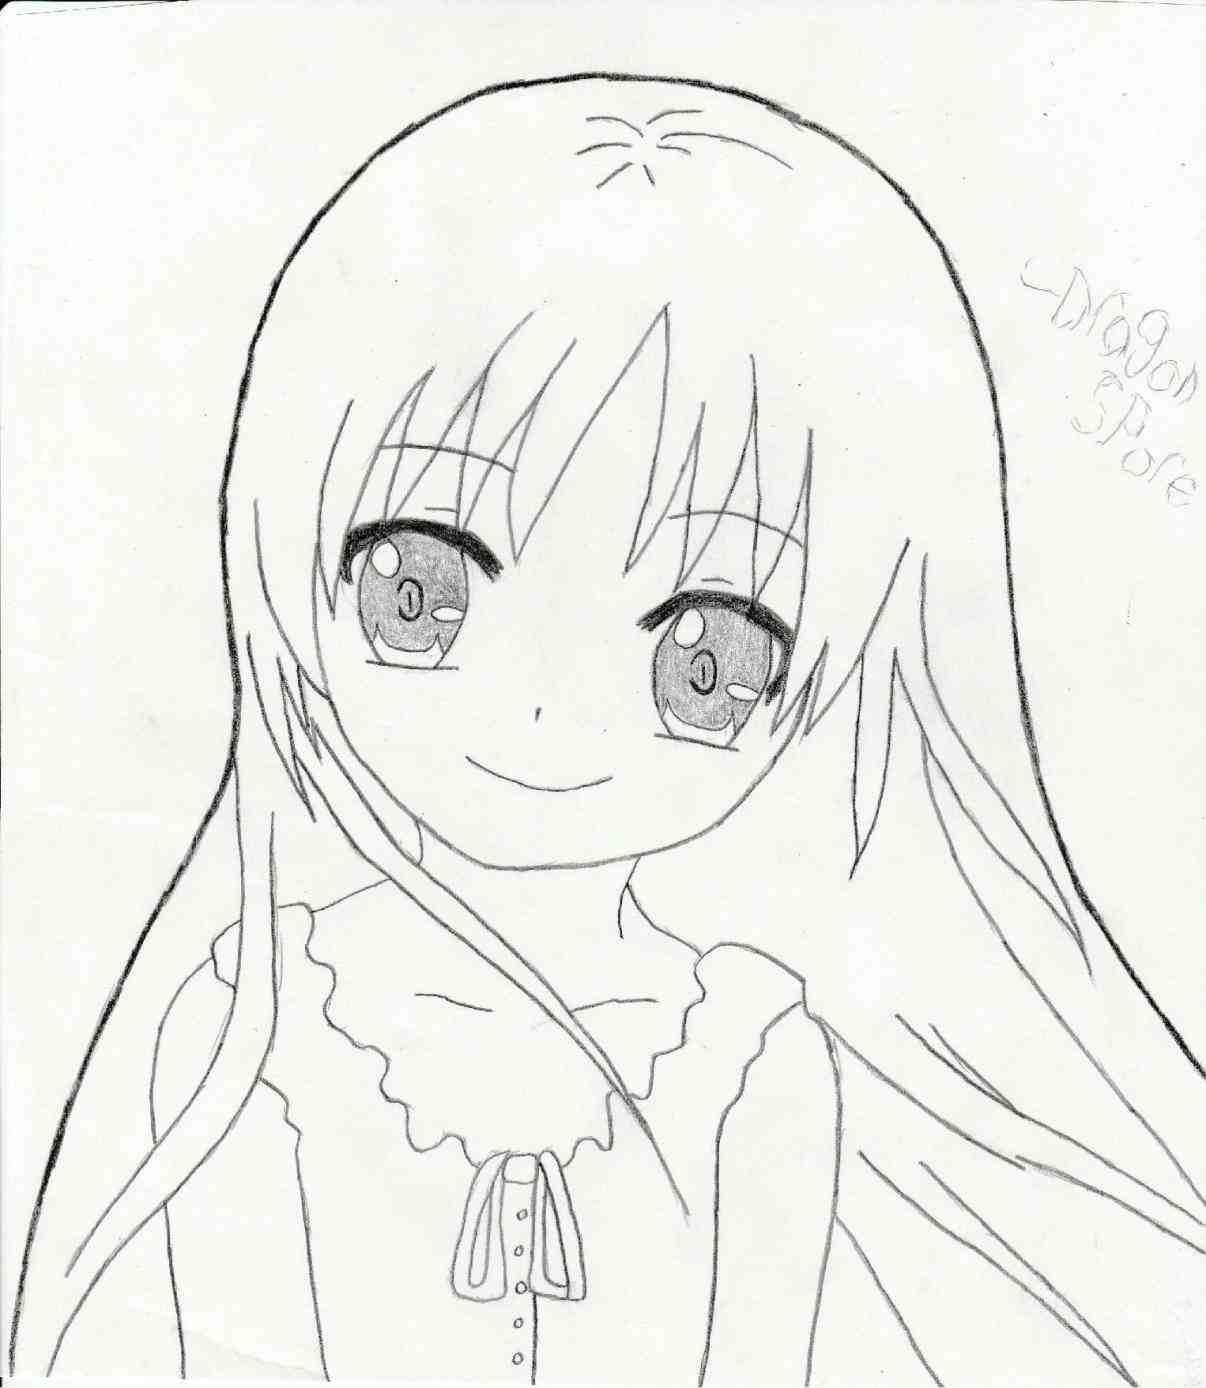 1206x1388 Cute Anime Girls Easy Drawings Google Search. Resultado De Imagem